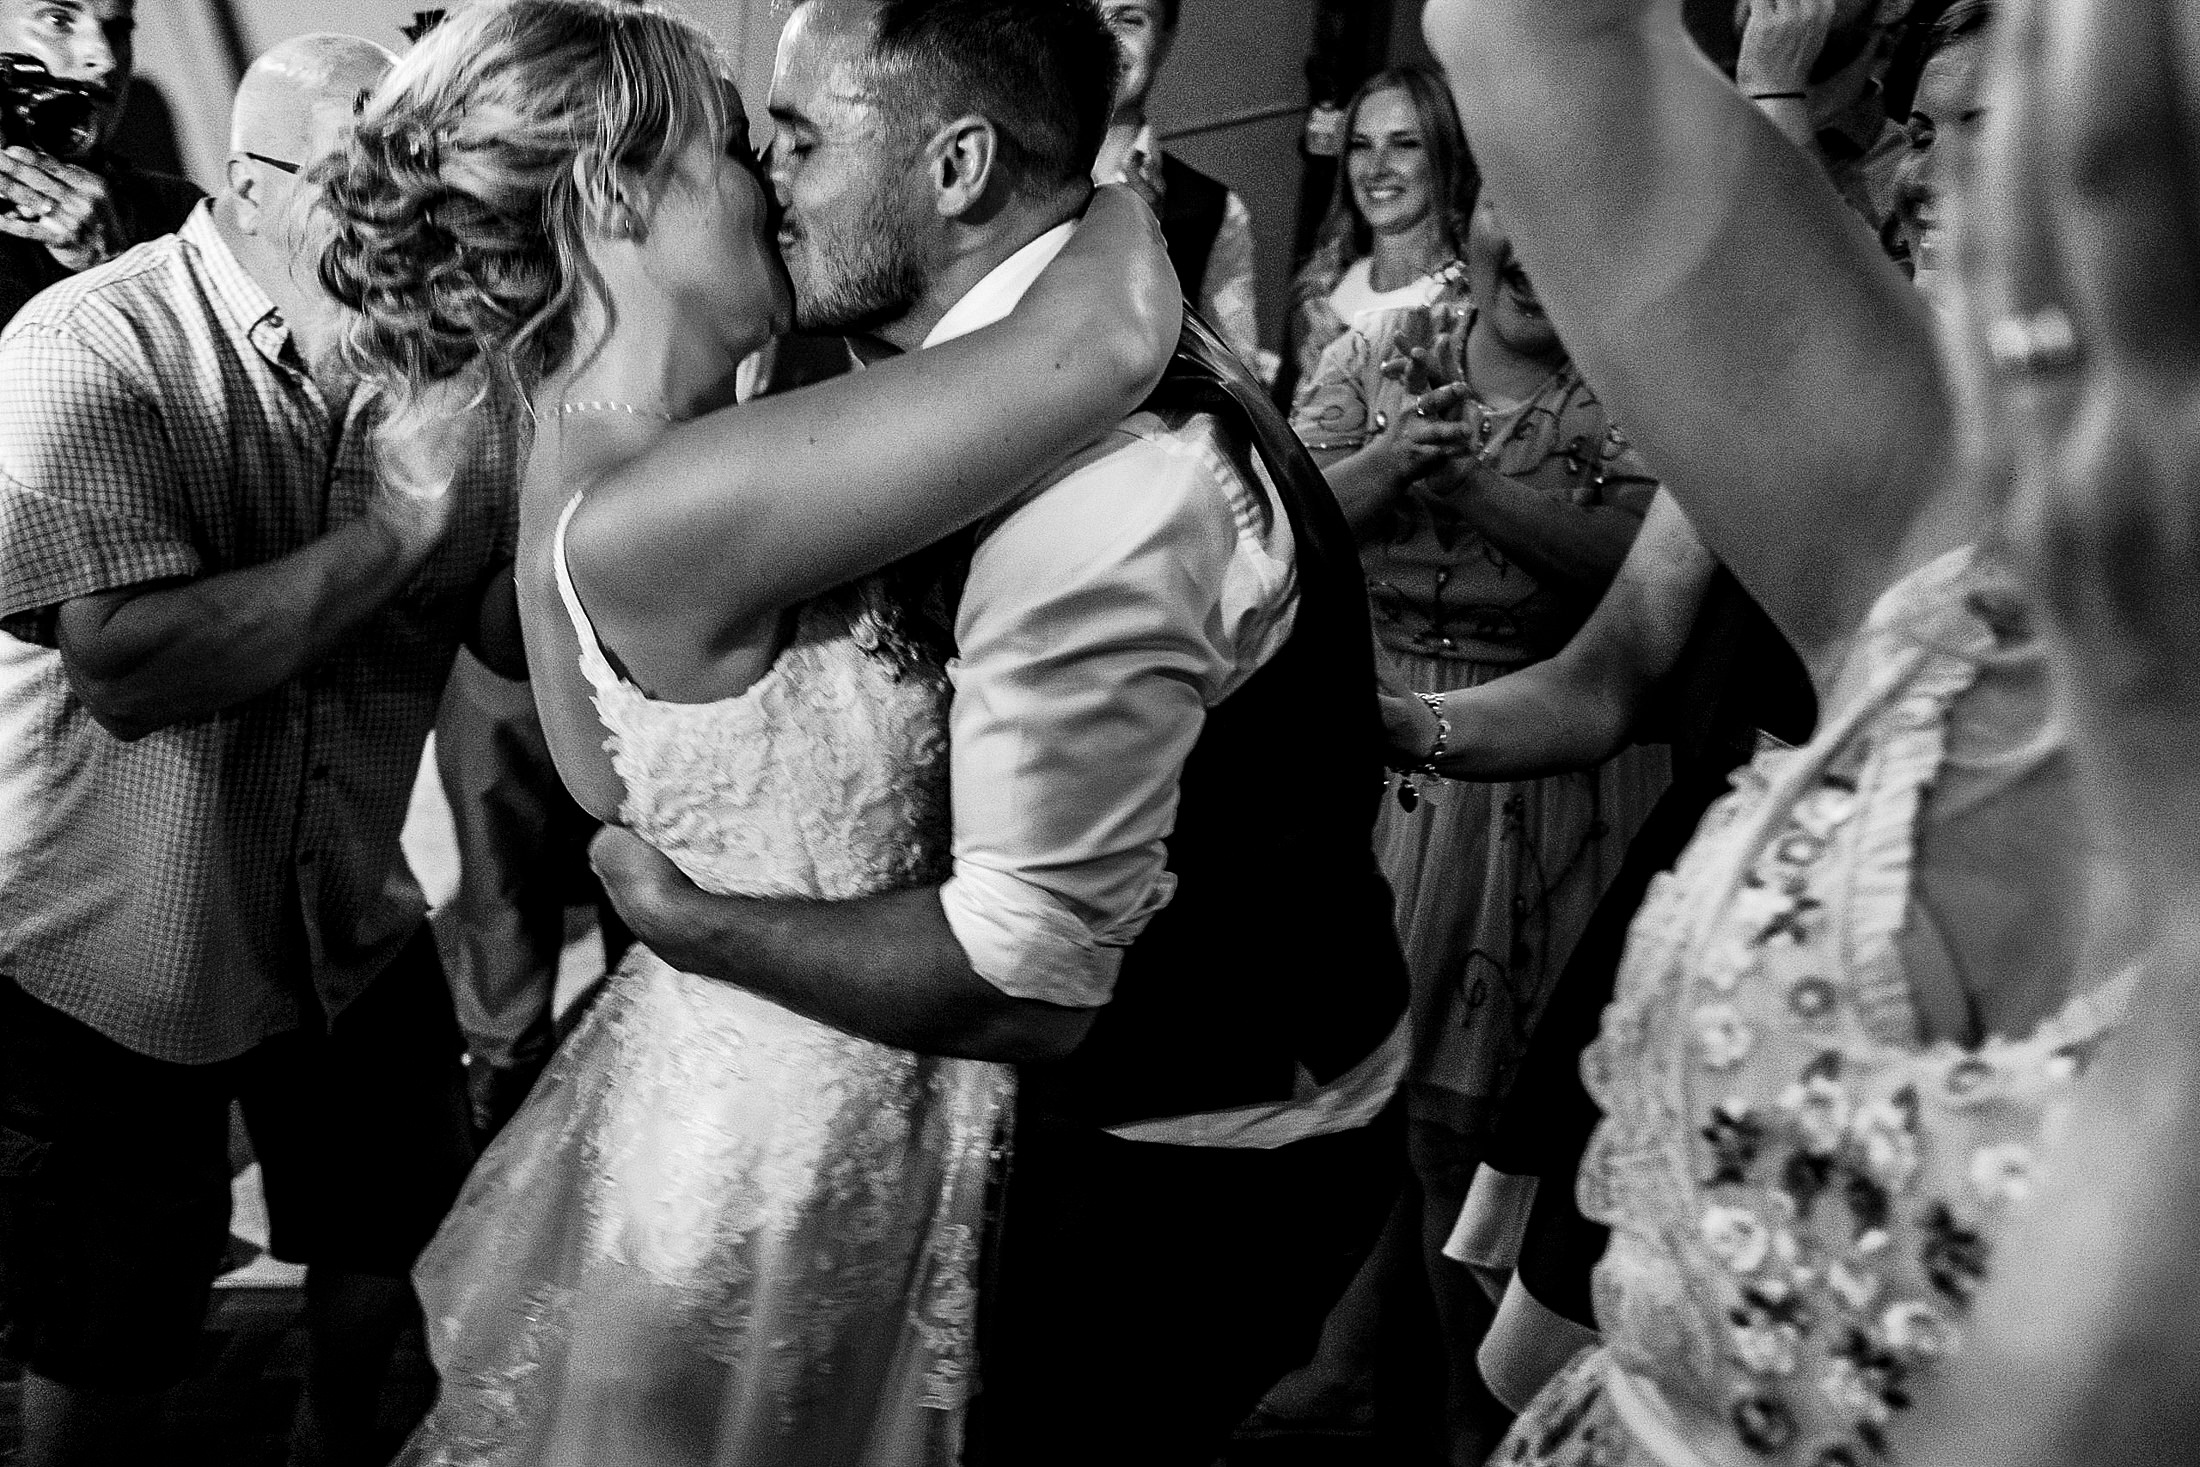 Dancefloor Kisses